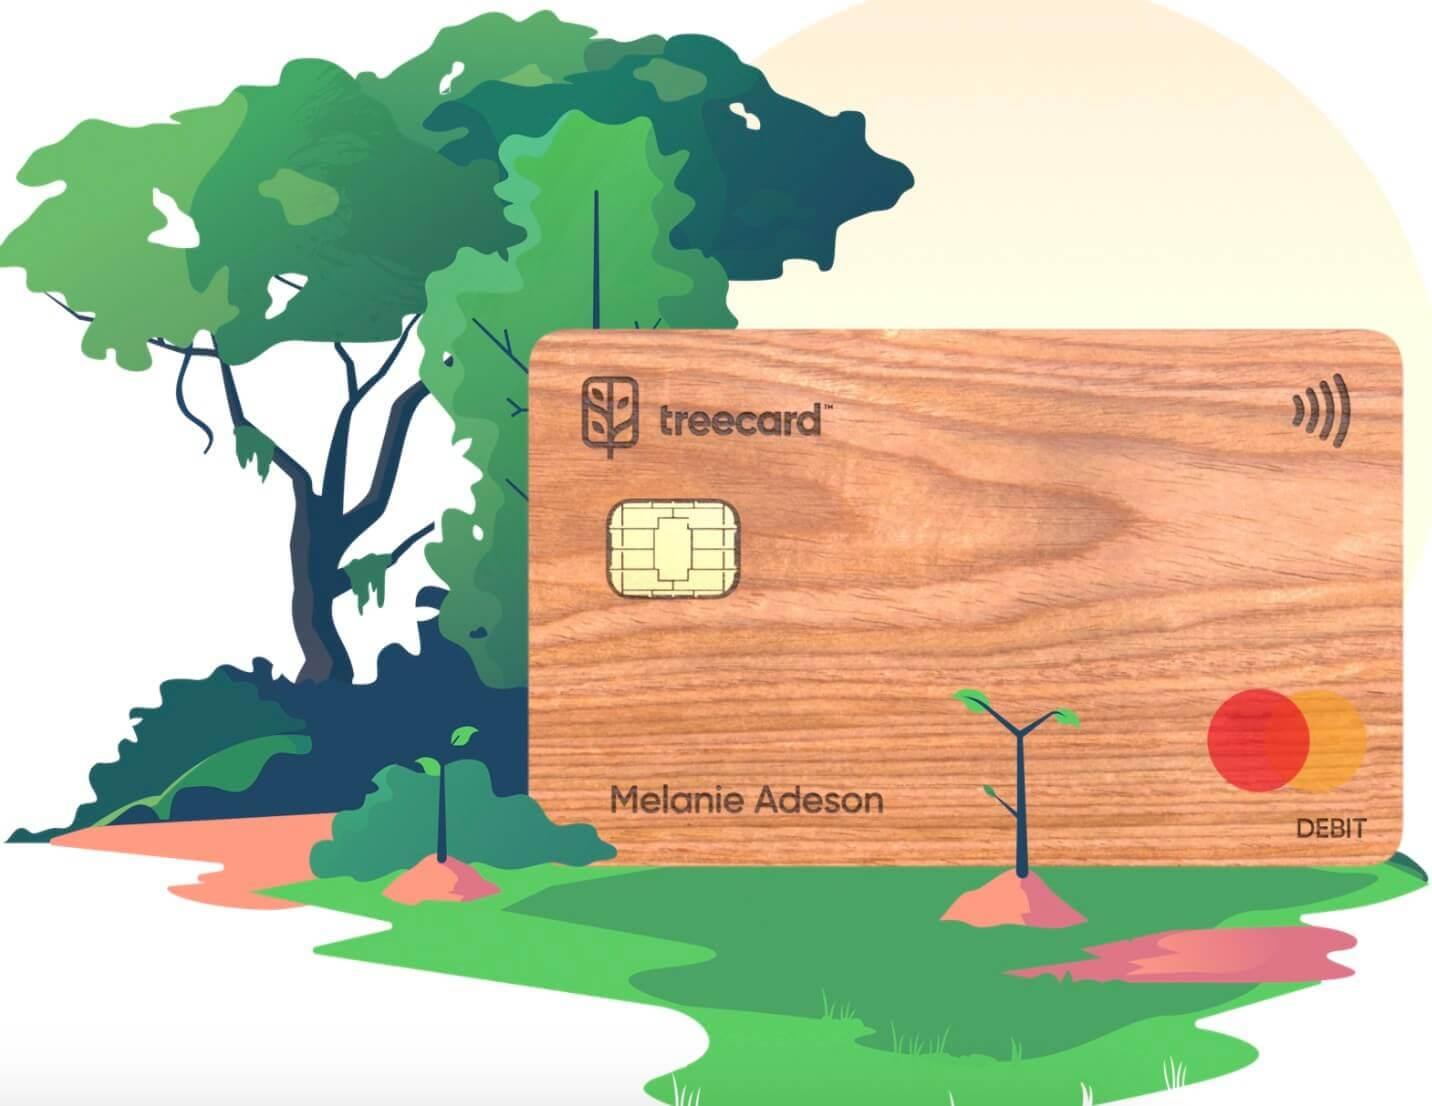 TreeCard的申请,美国万事达借记卡